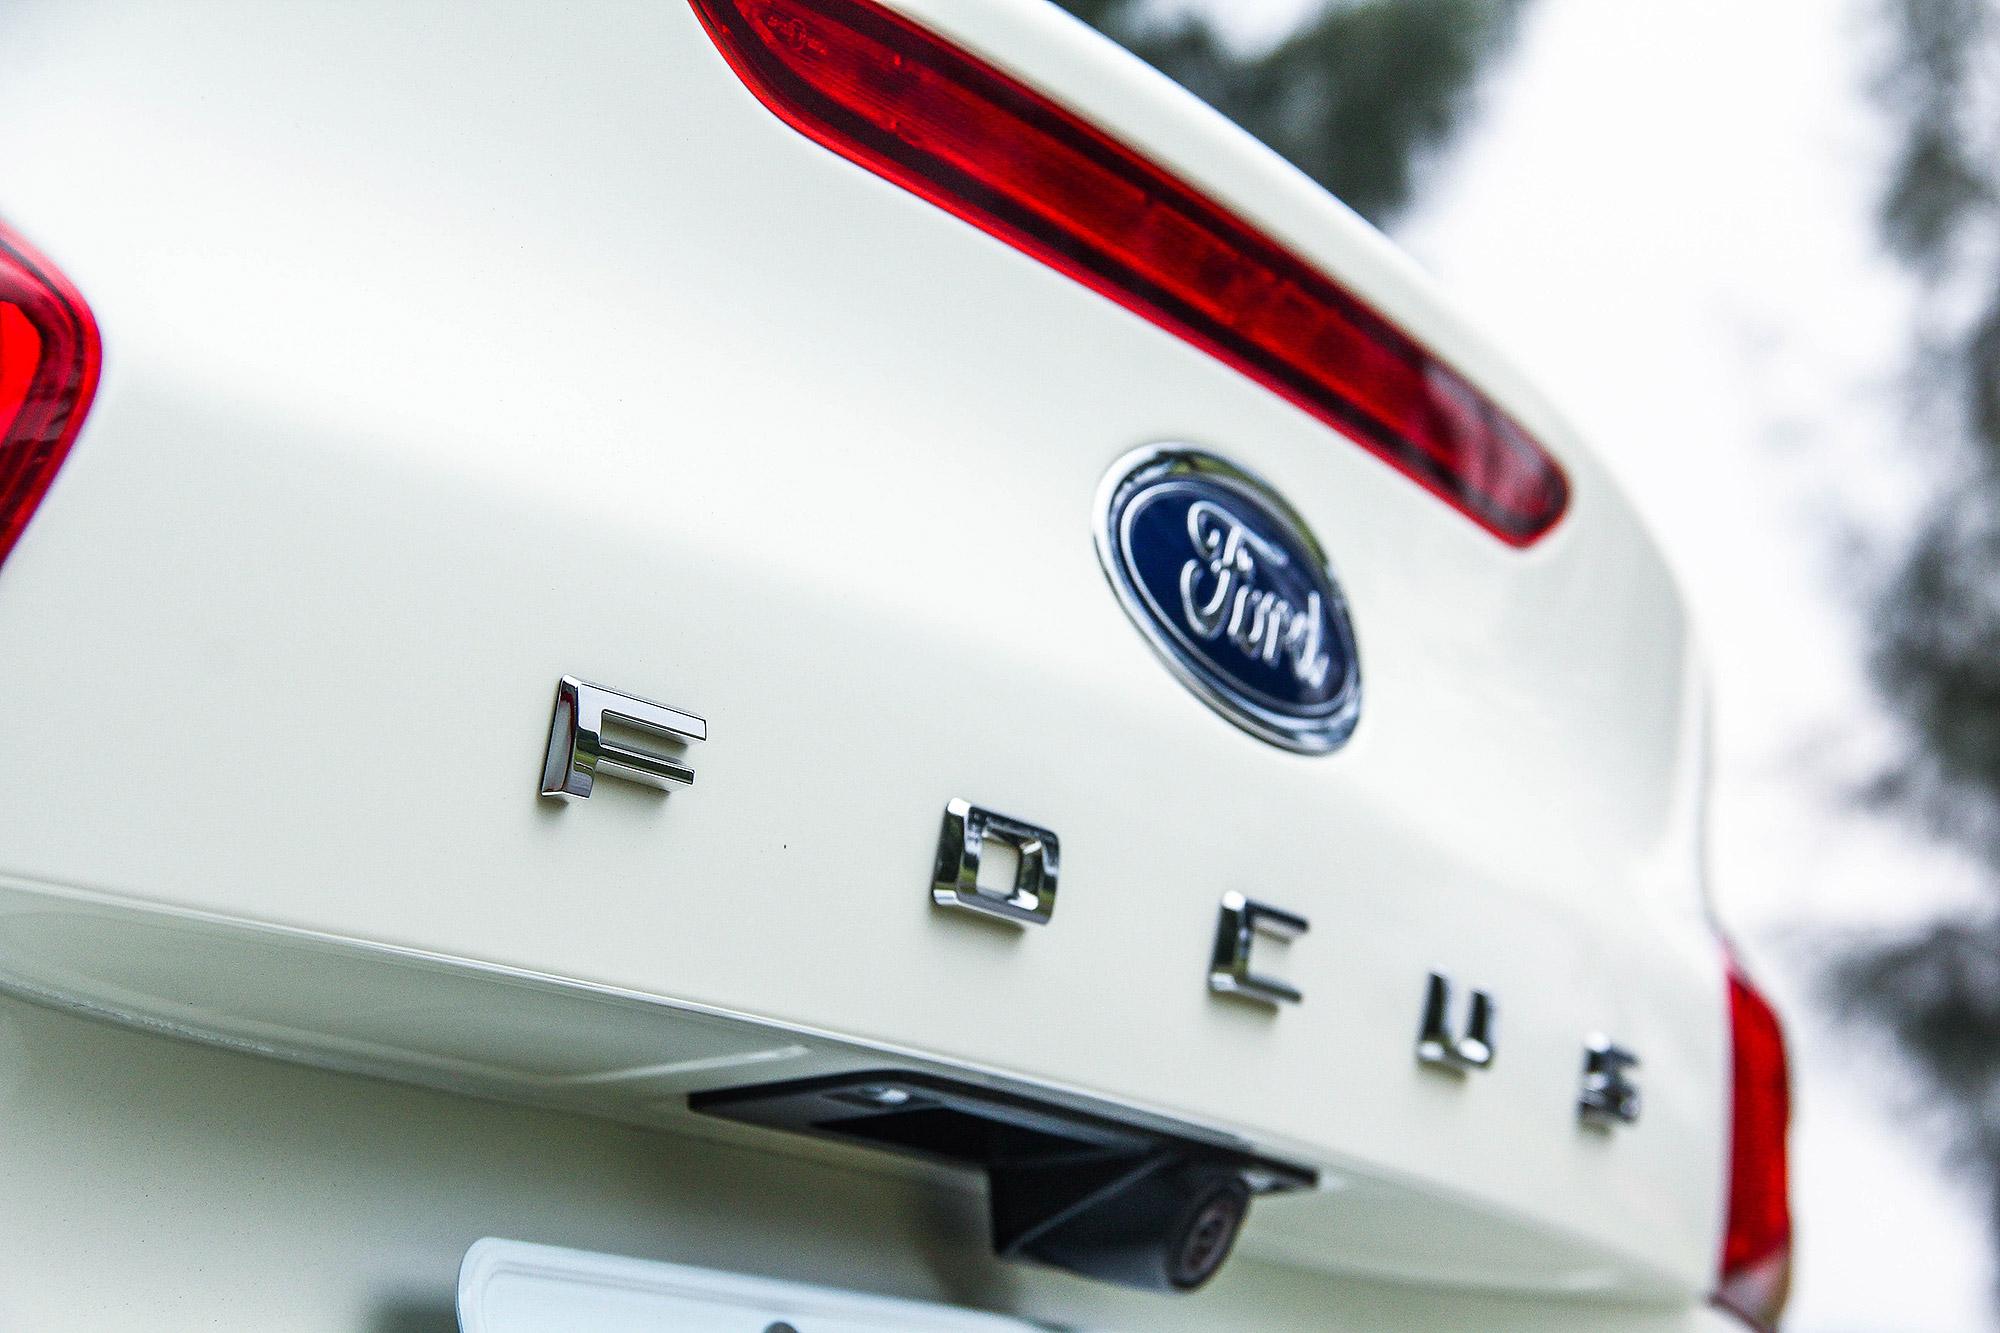 Ford 針對 Focus 推出 4D 美夢型與 5D 成真型作為入門車型。